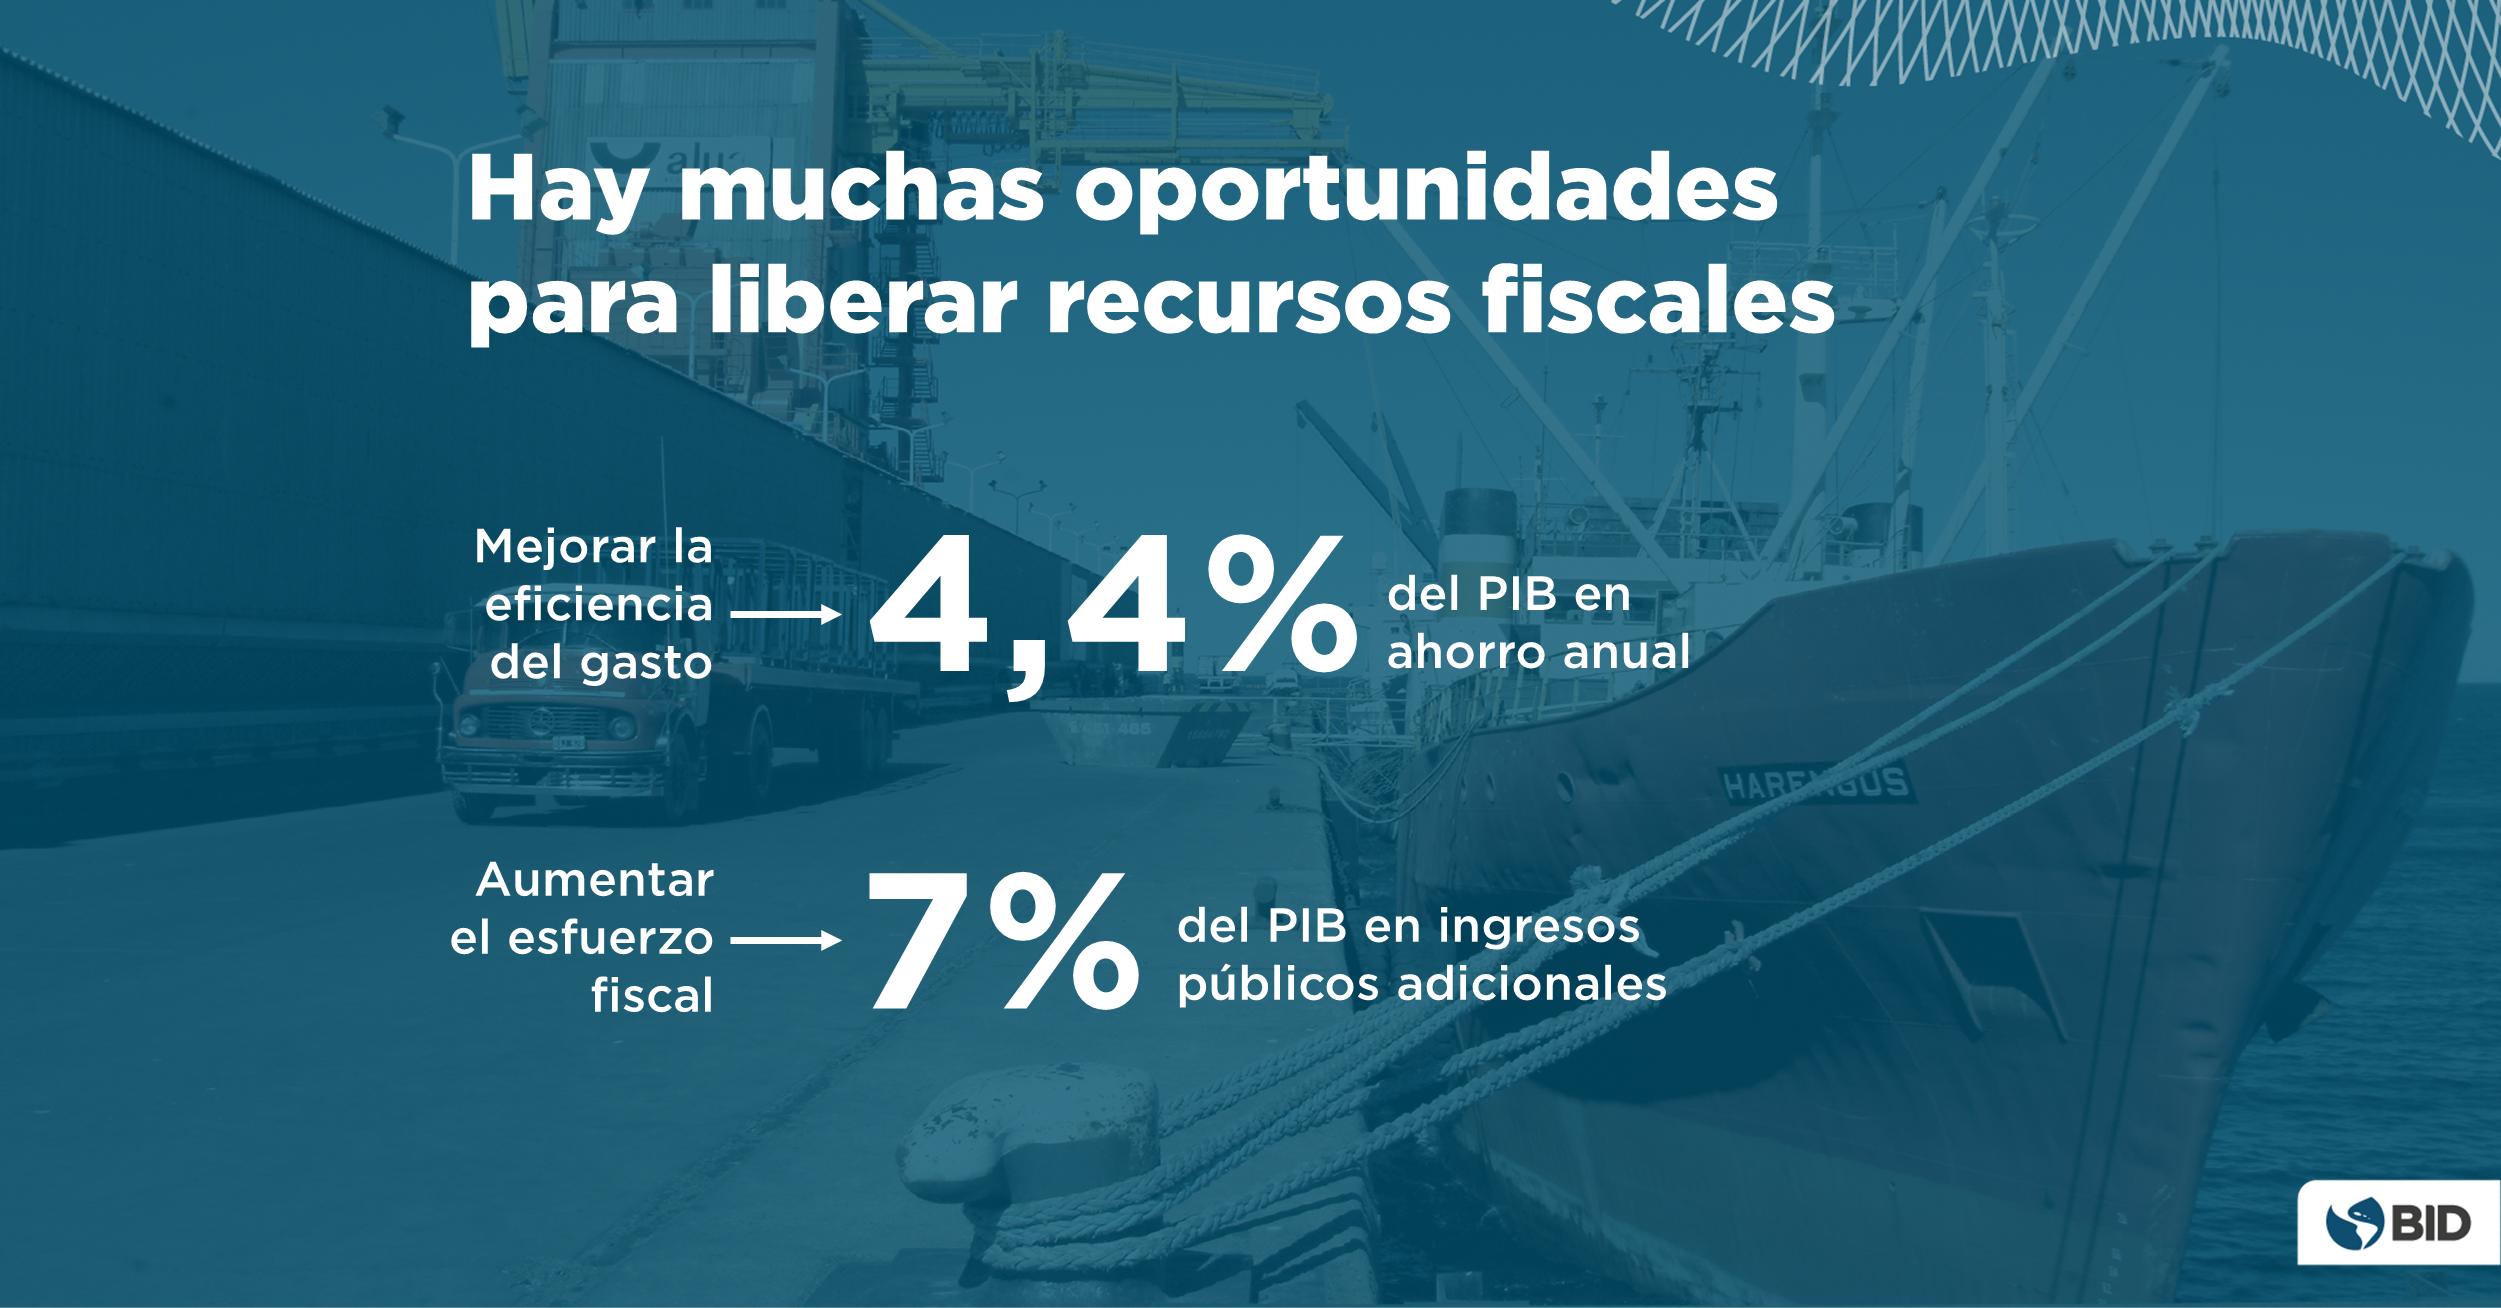 Informe Macroeconomico America Latina Caribe 2021 - Oportunidades